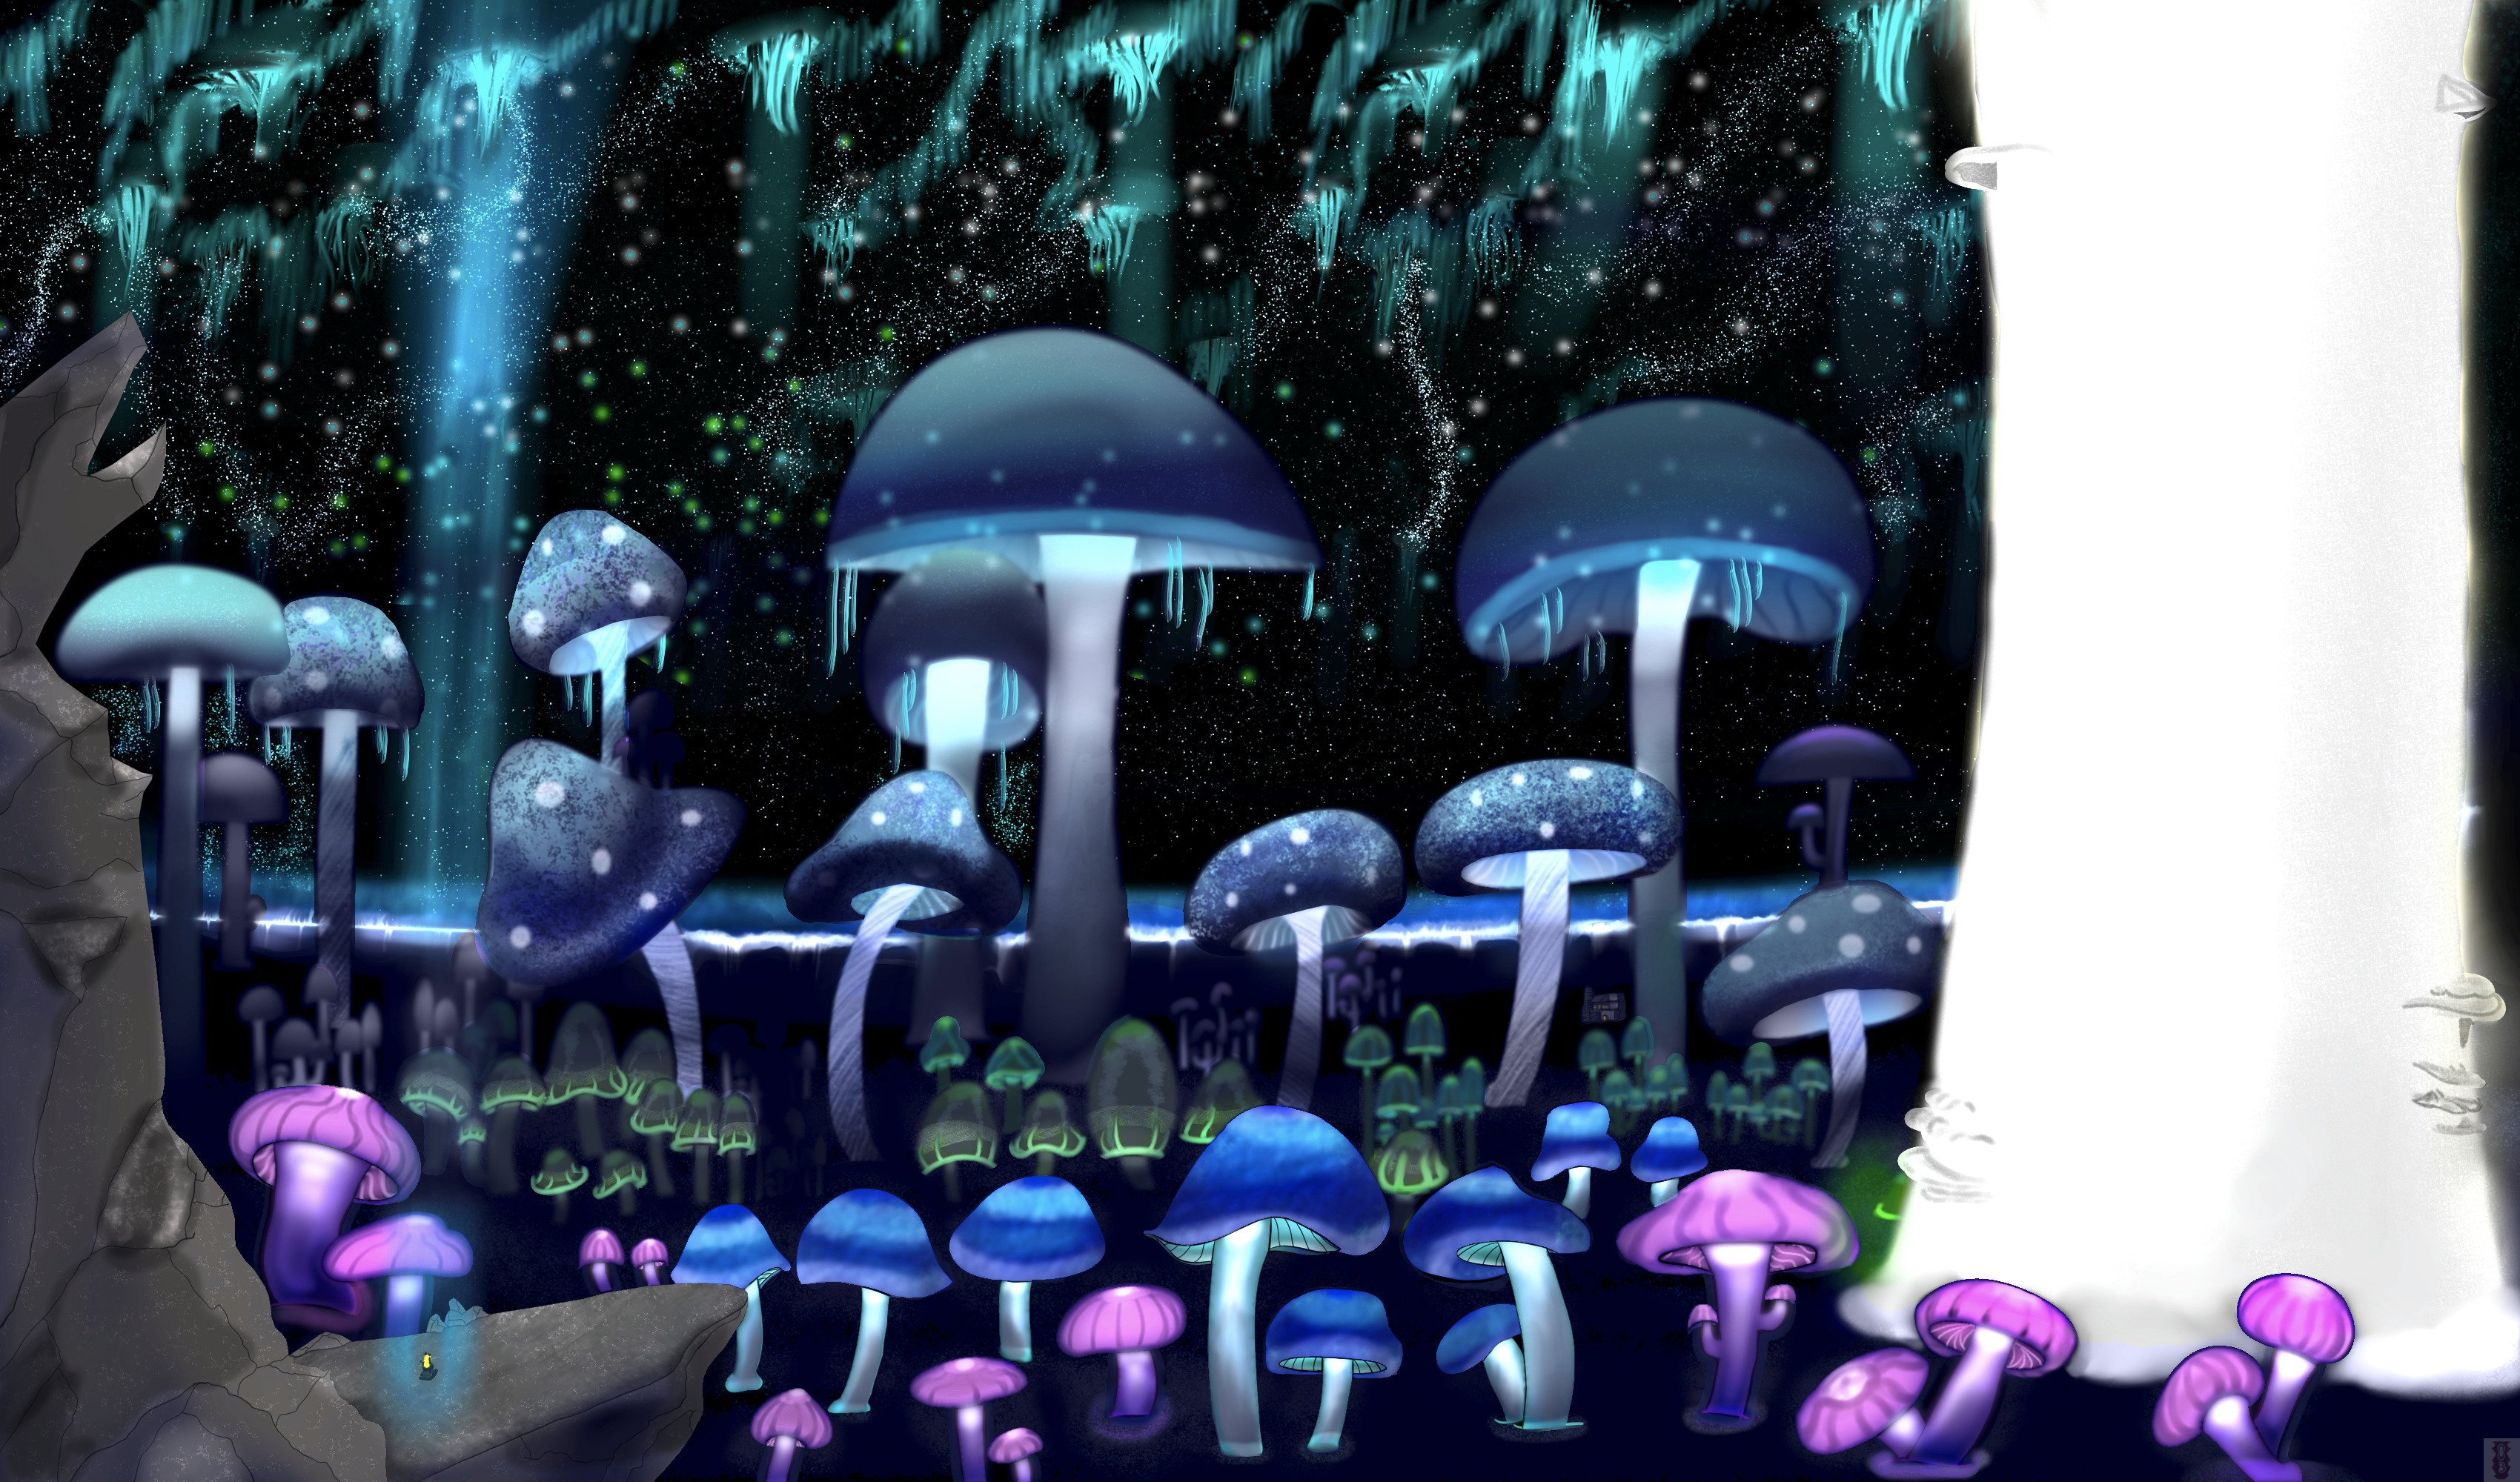 The Bioshroom